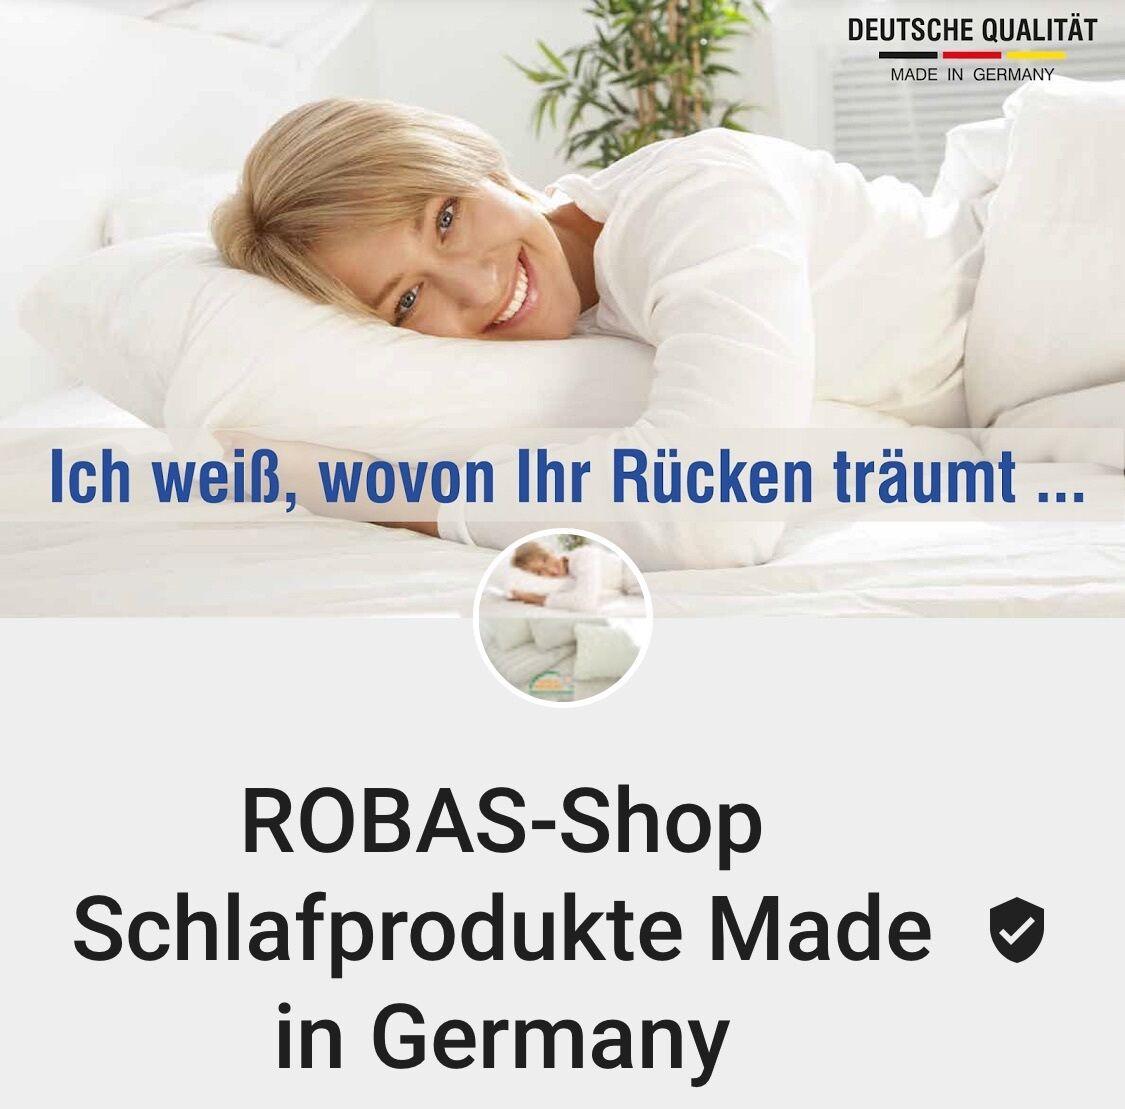 ROBAS-SHOP